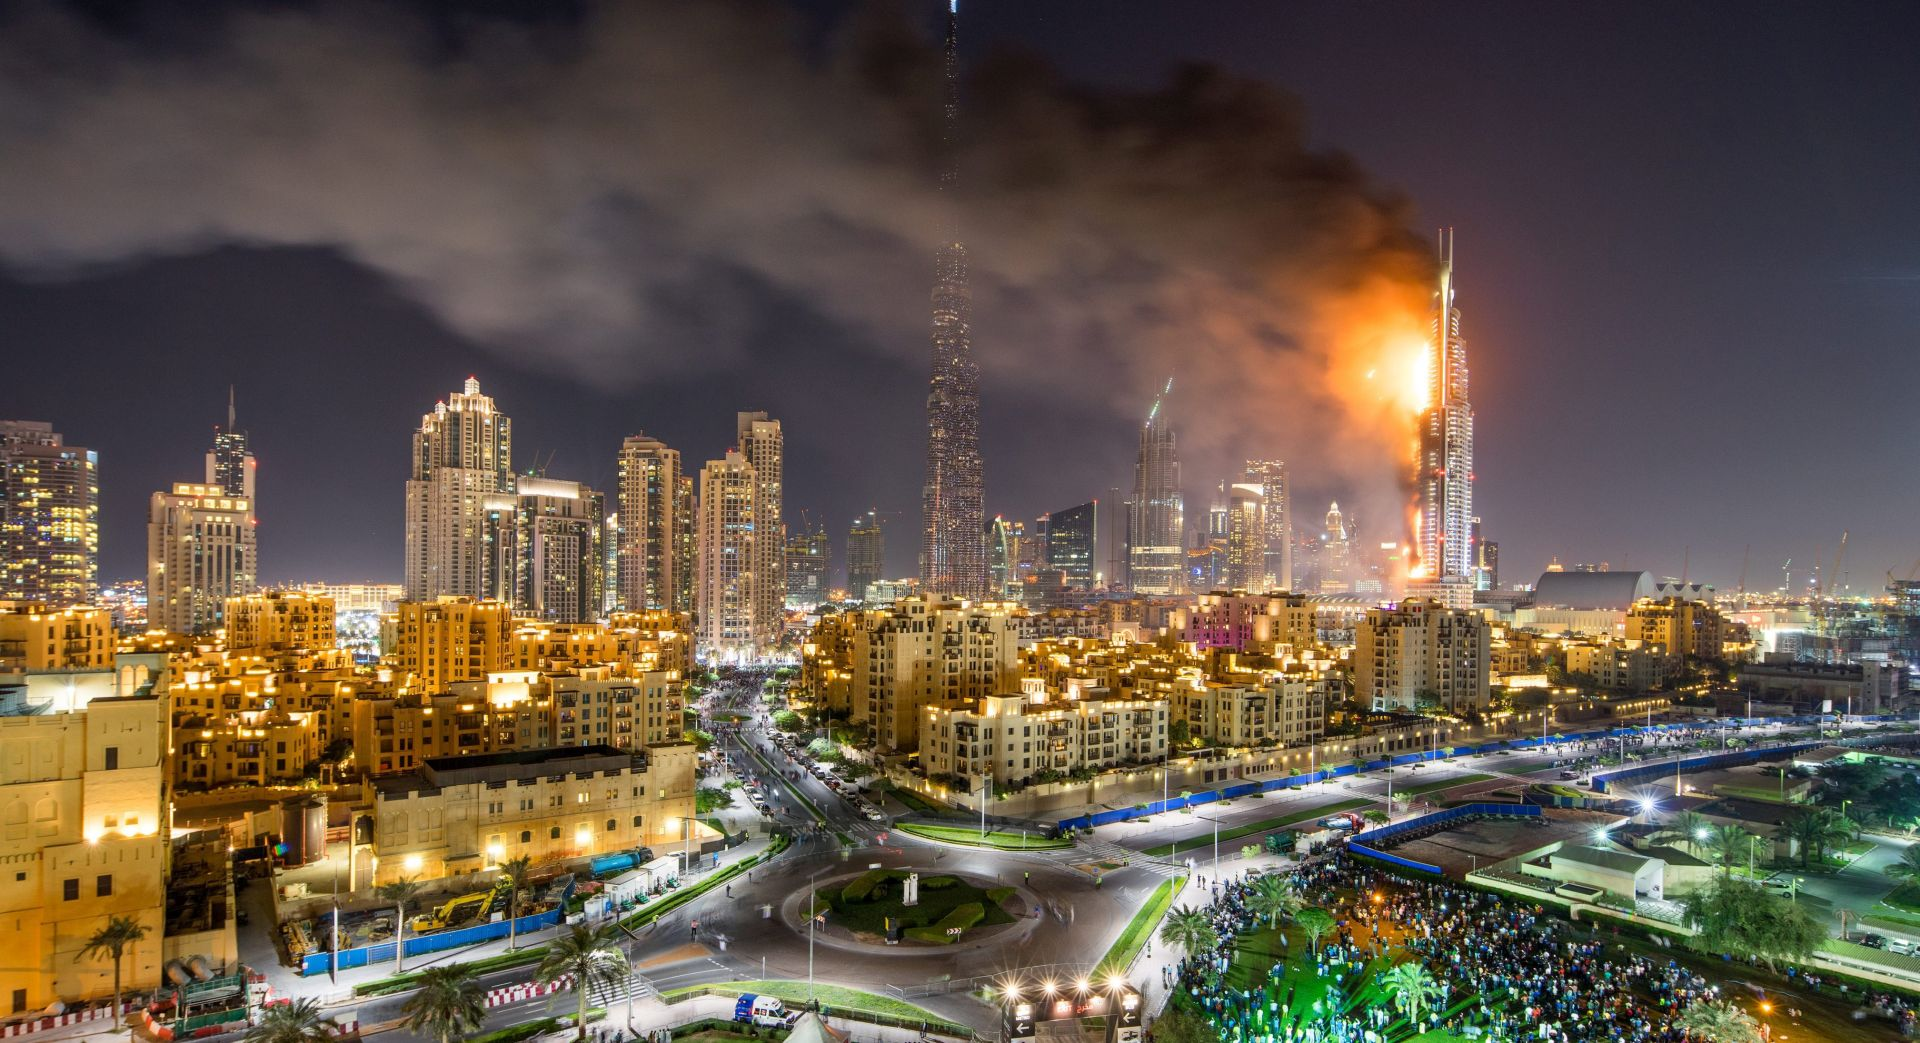 Požar progutao još jedan toranj u središtu Dubaija